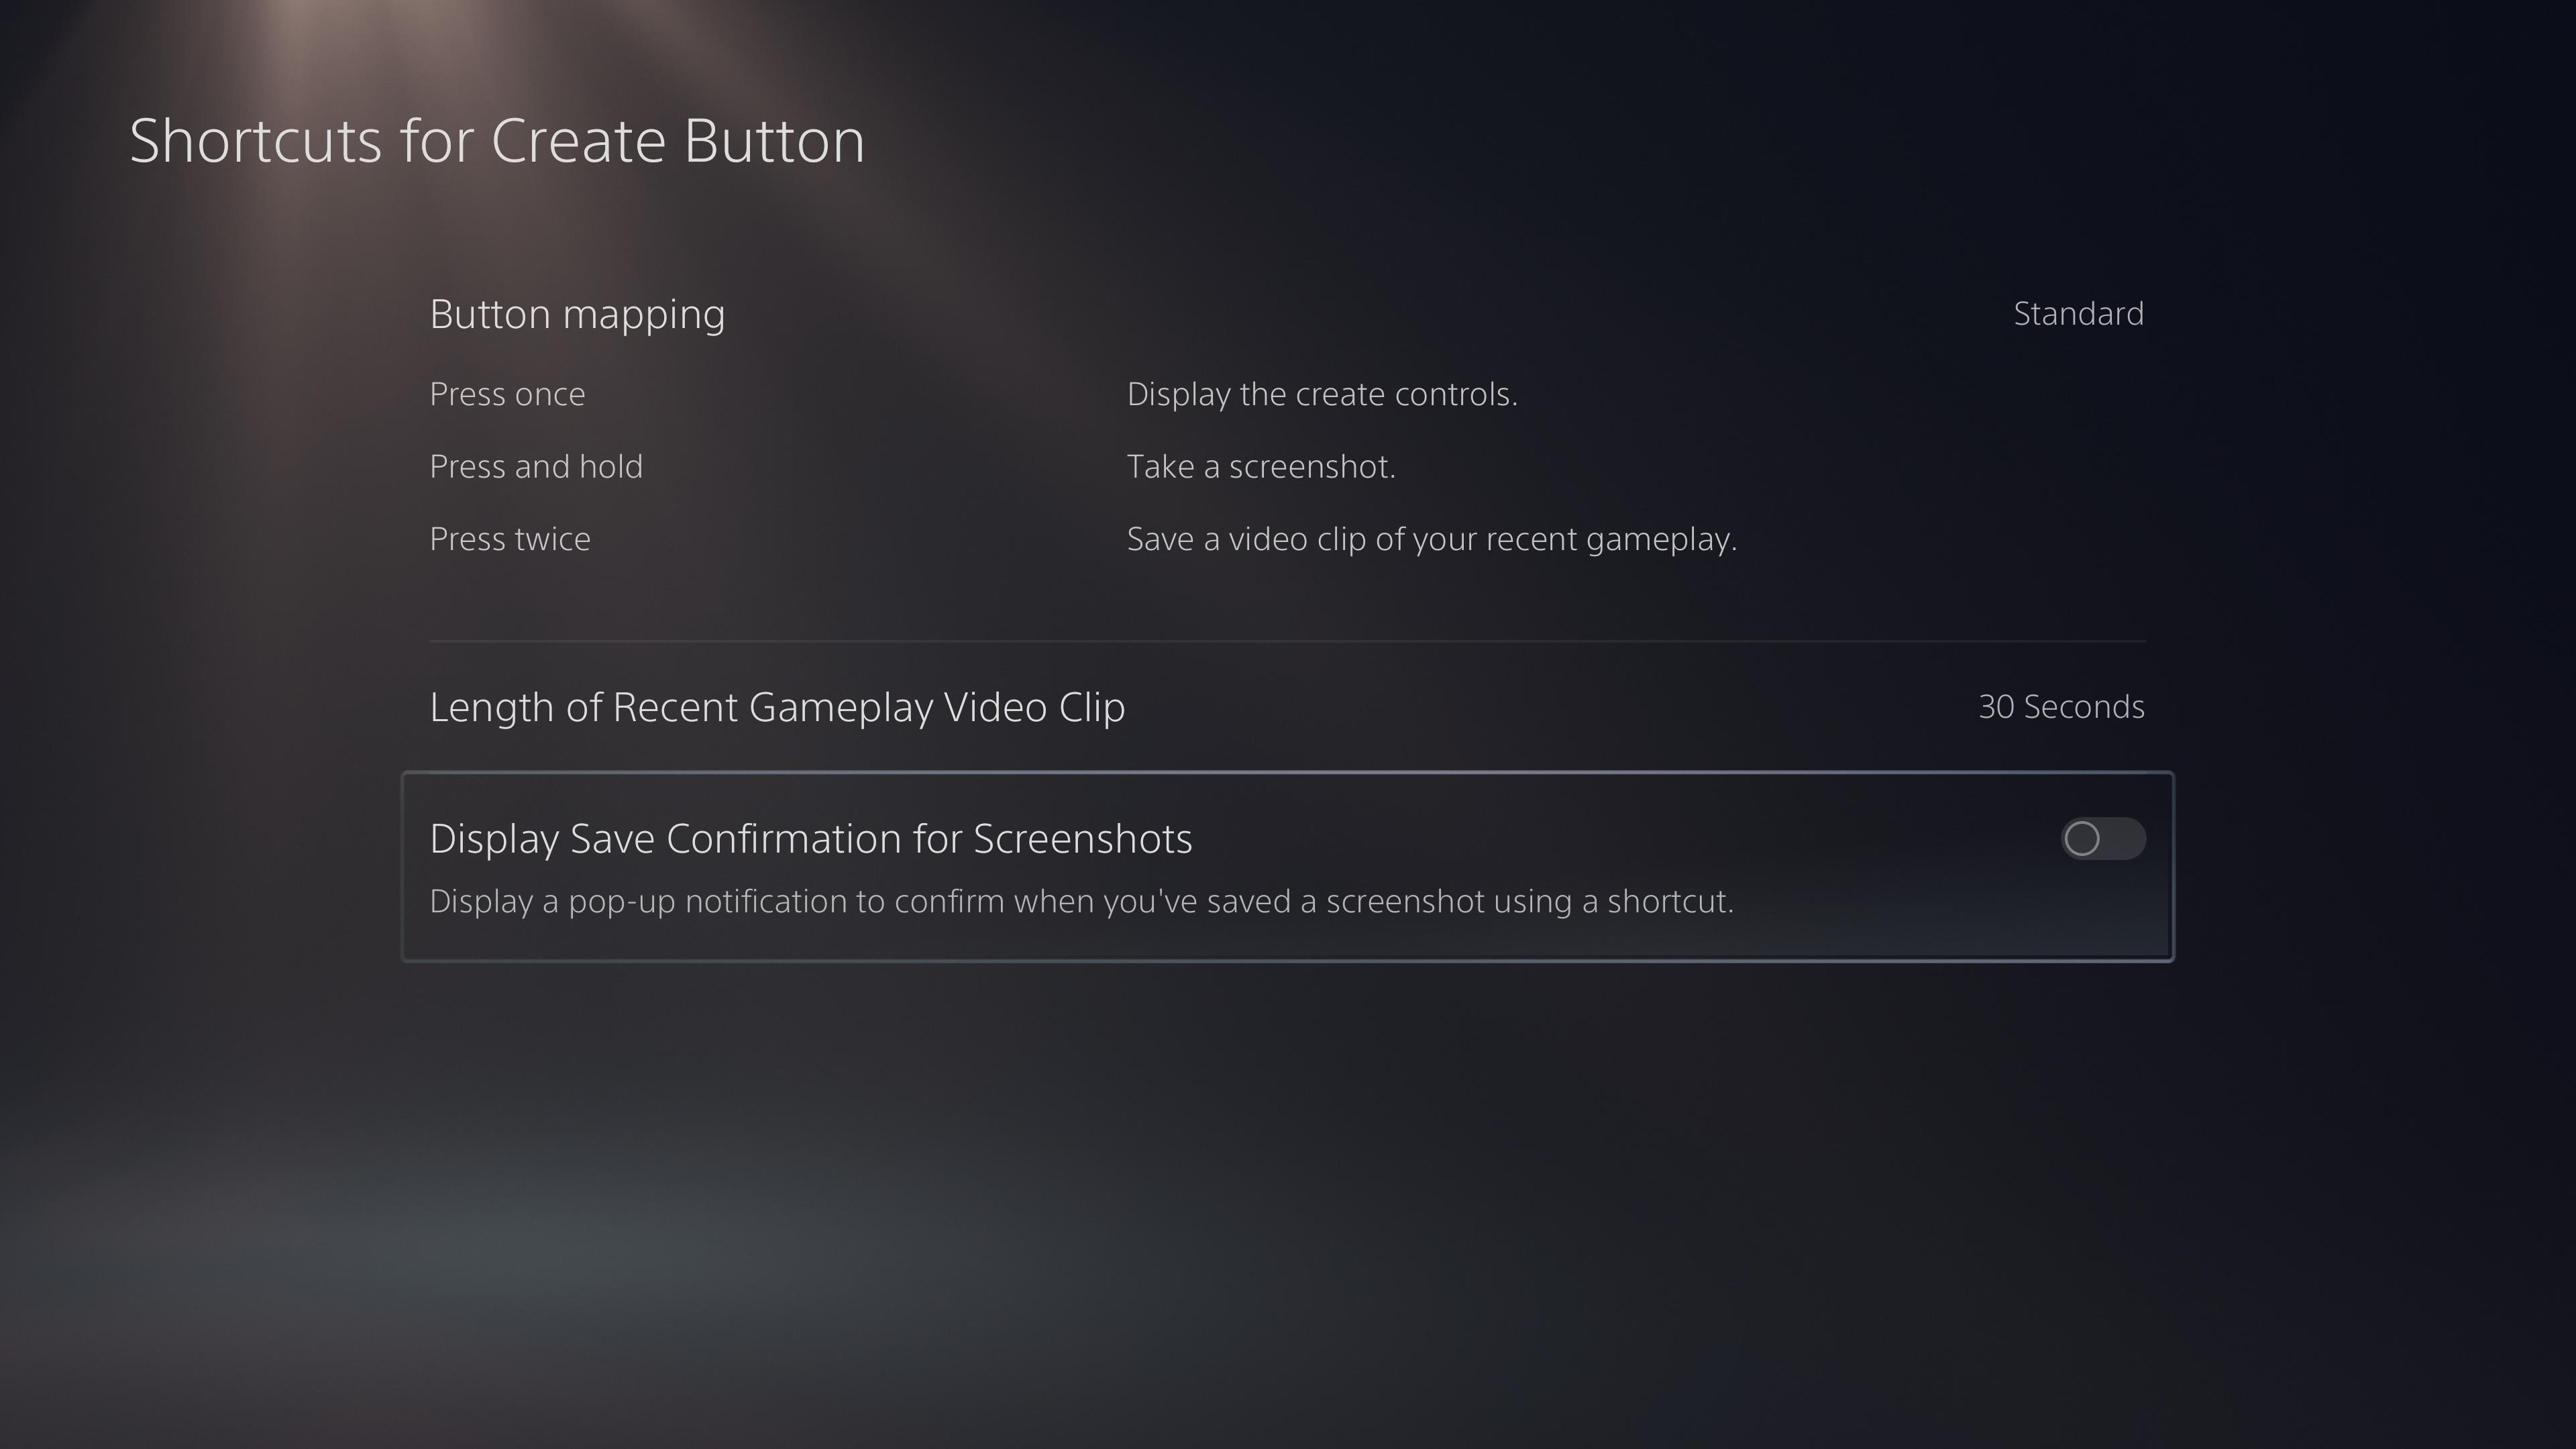 PS5 screenshot feature options